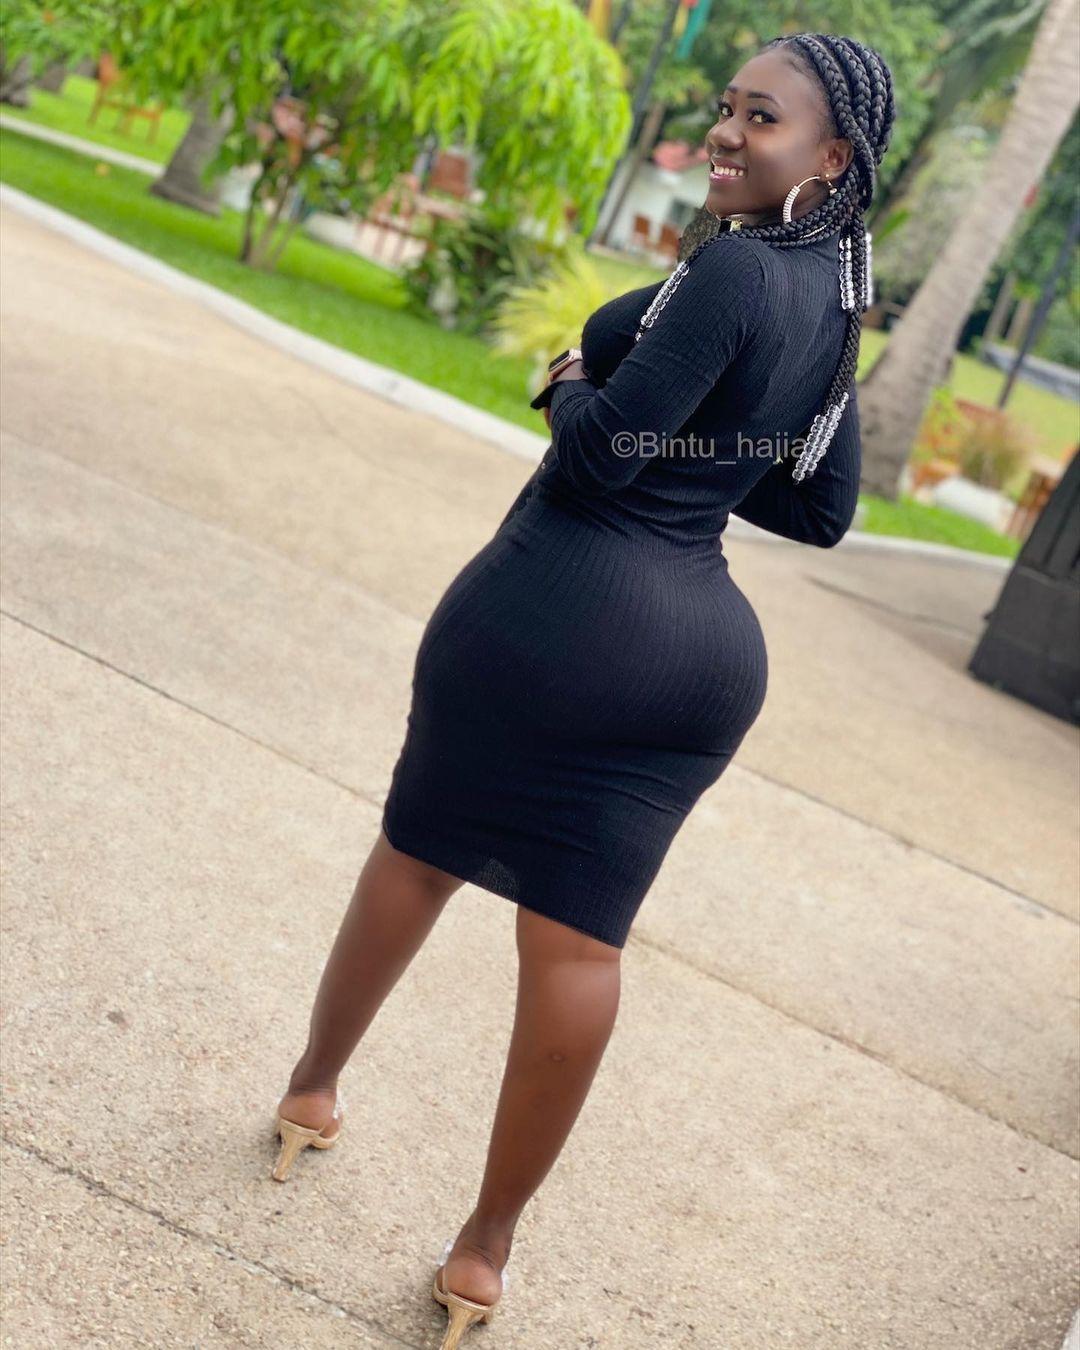 Pin by Charles Johnson on 1 | Fine girls, Beautiful black women, Summer dresses